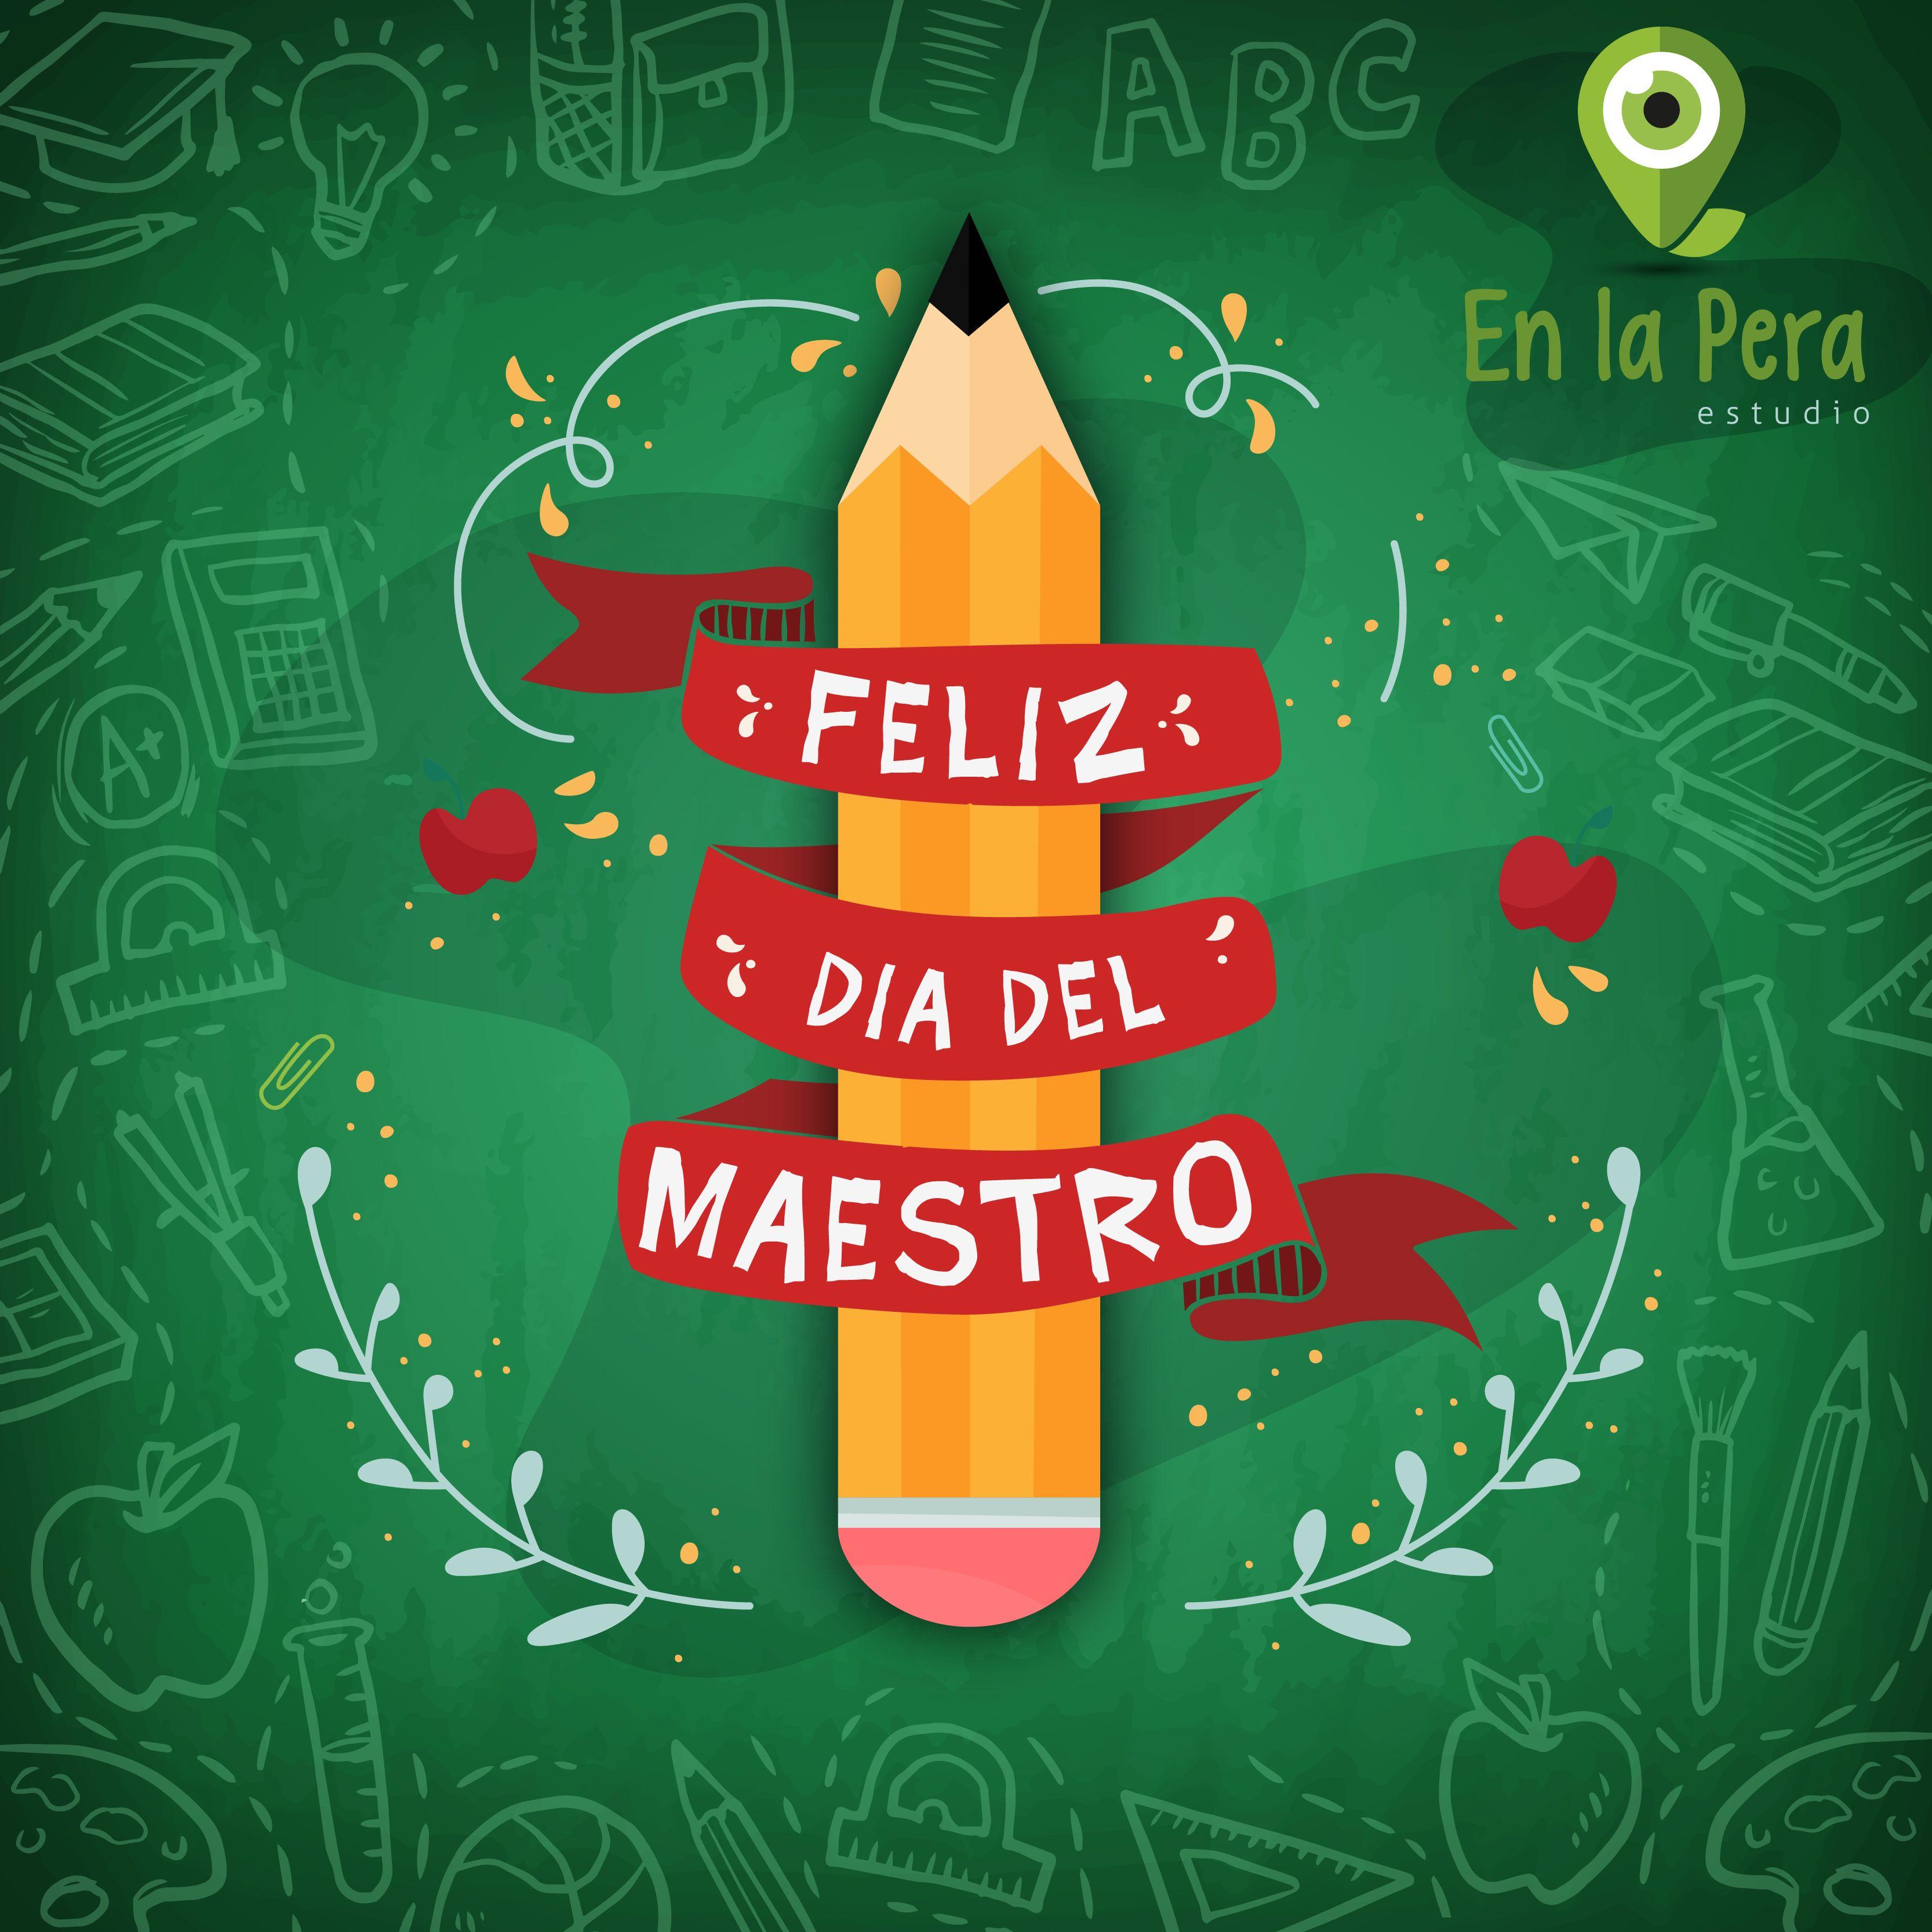 Feliz dia del maestro #maestro #diadelmaestro #teacher #argentina #teacherday #diseño #enlapera #diadelmaestro